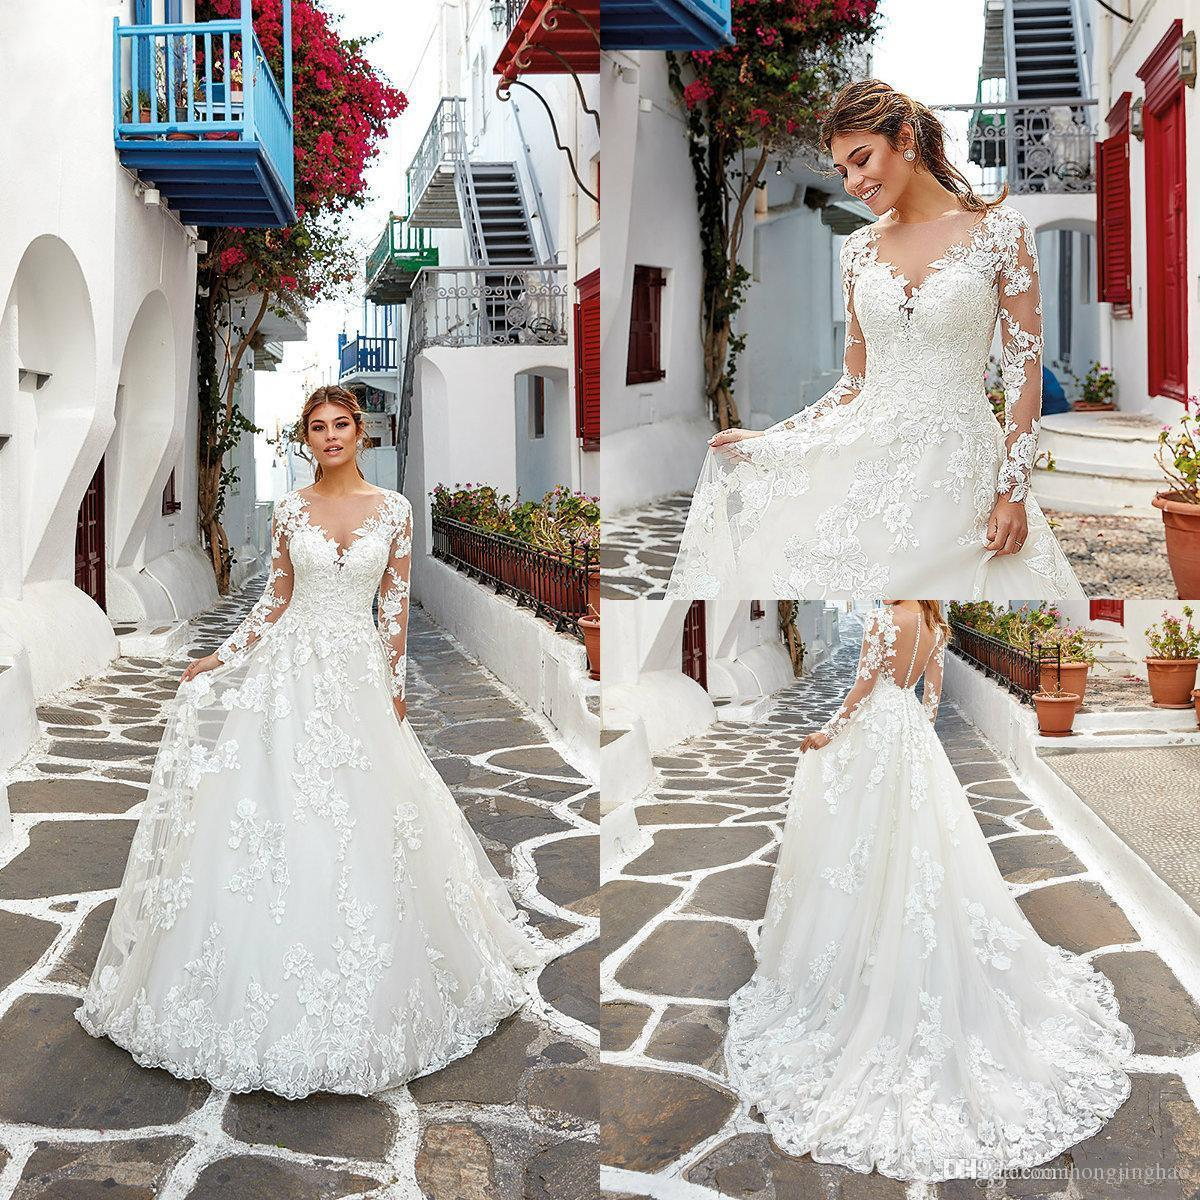 2020 A Line Wedding Dresses Sheer Jewel Neck Appliqued Long Sleeve Bridal Gowns Wedding Gowns vestido de noiva